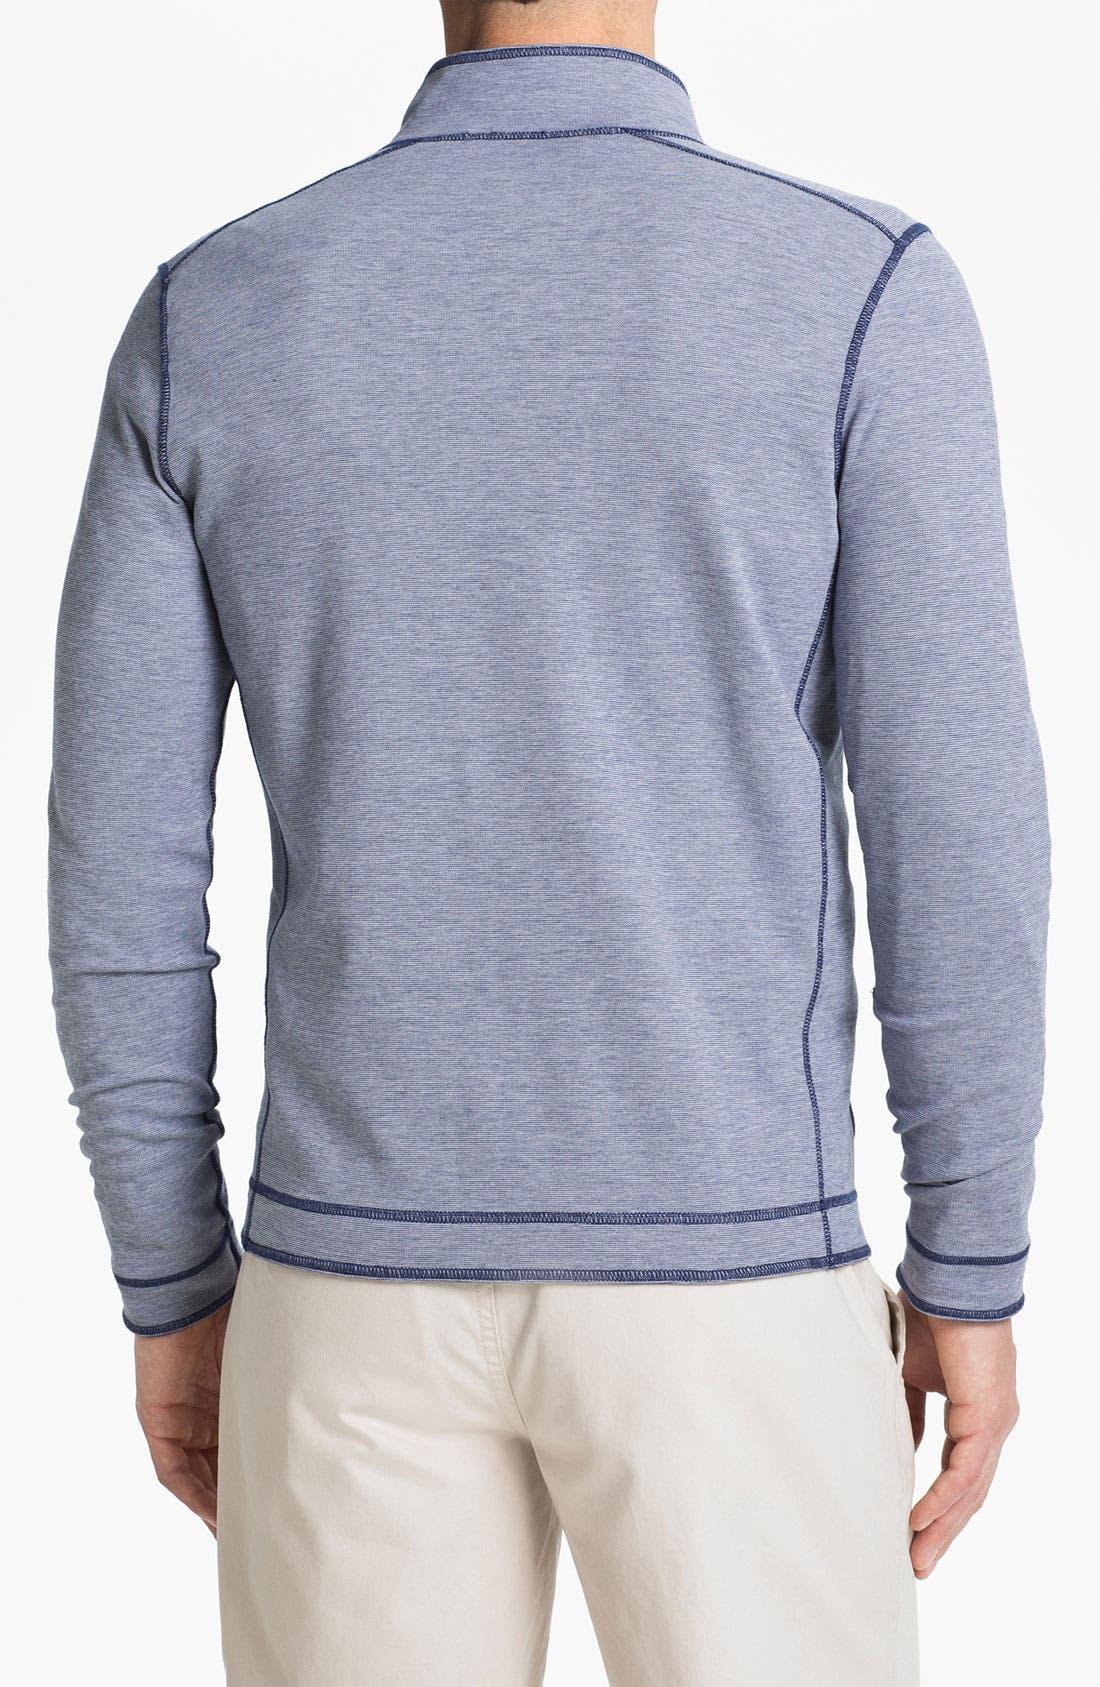 Alternate Image 2  - BOSS Black 'Cannobio' Full Zip Knit Jacket